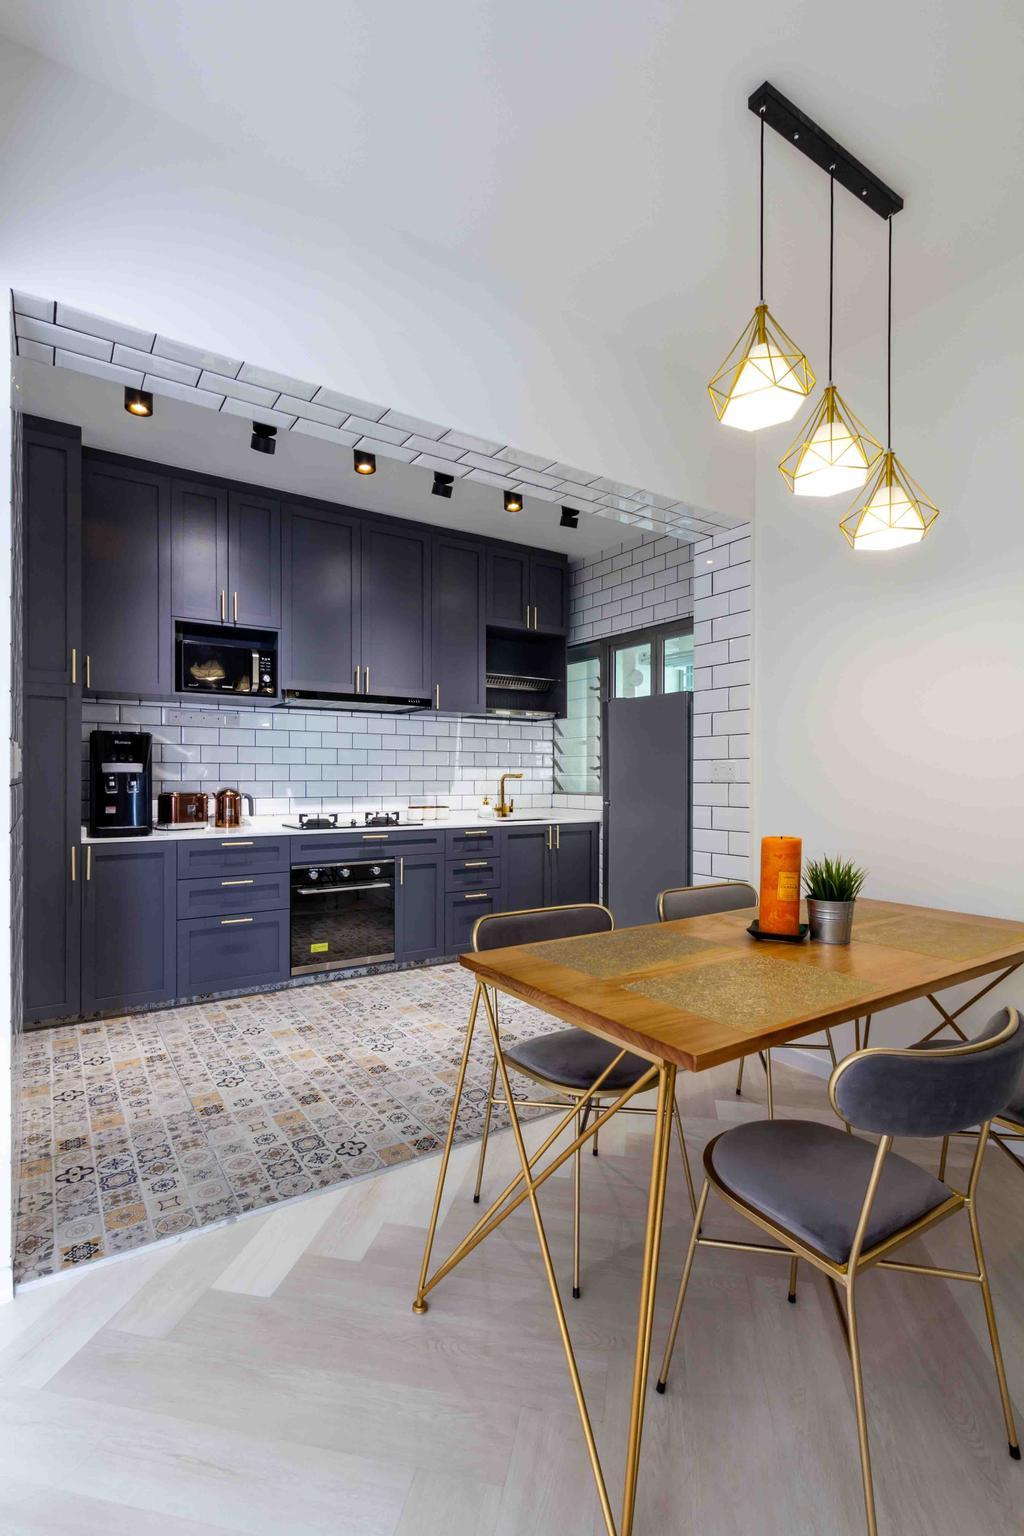 Virtual Kitchen Design Hdb Singapore: Interior Design Singapore